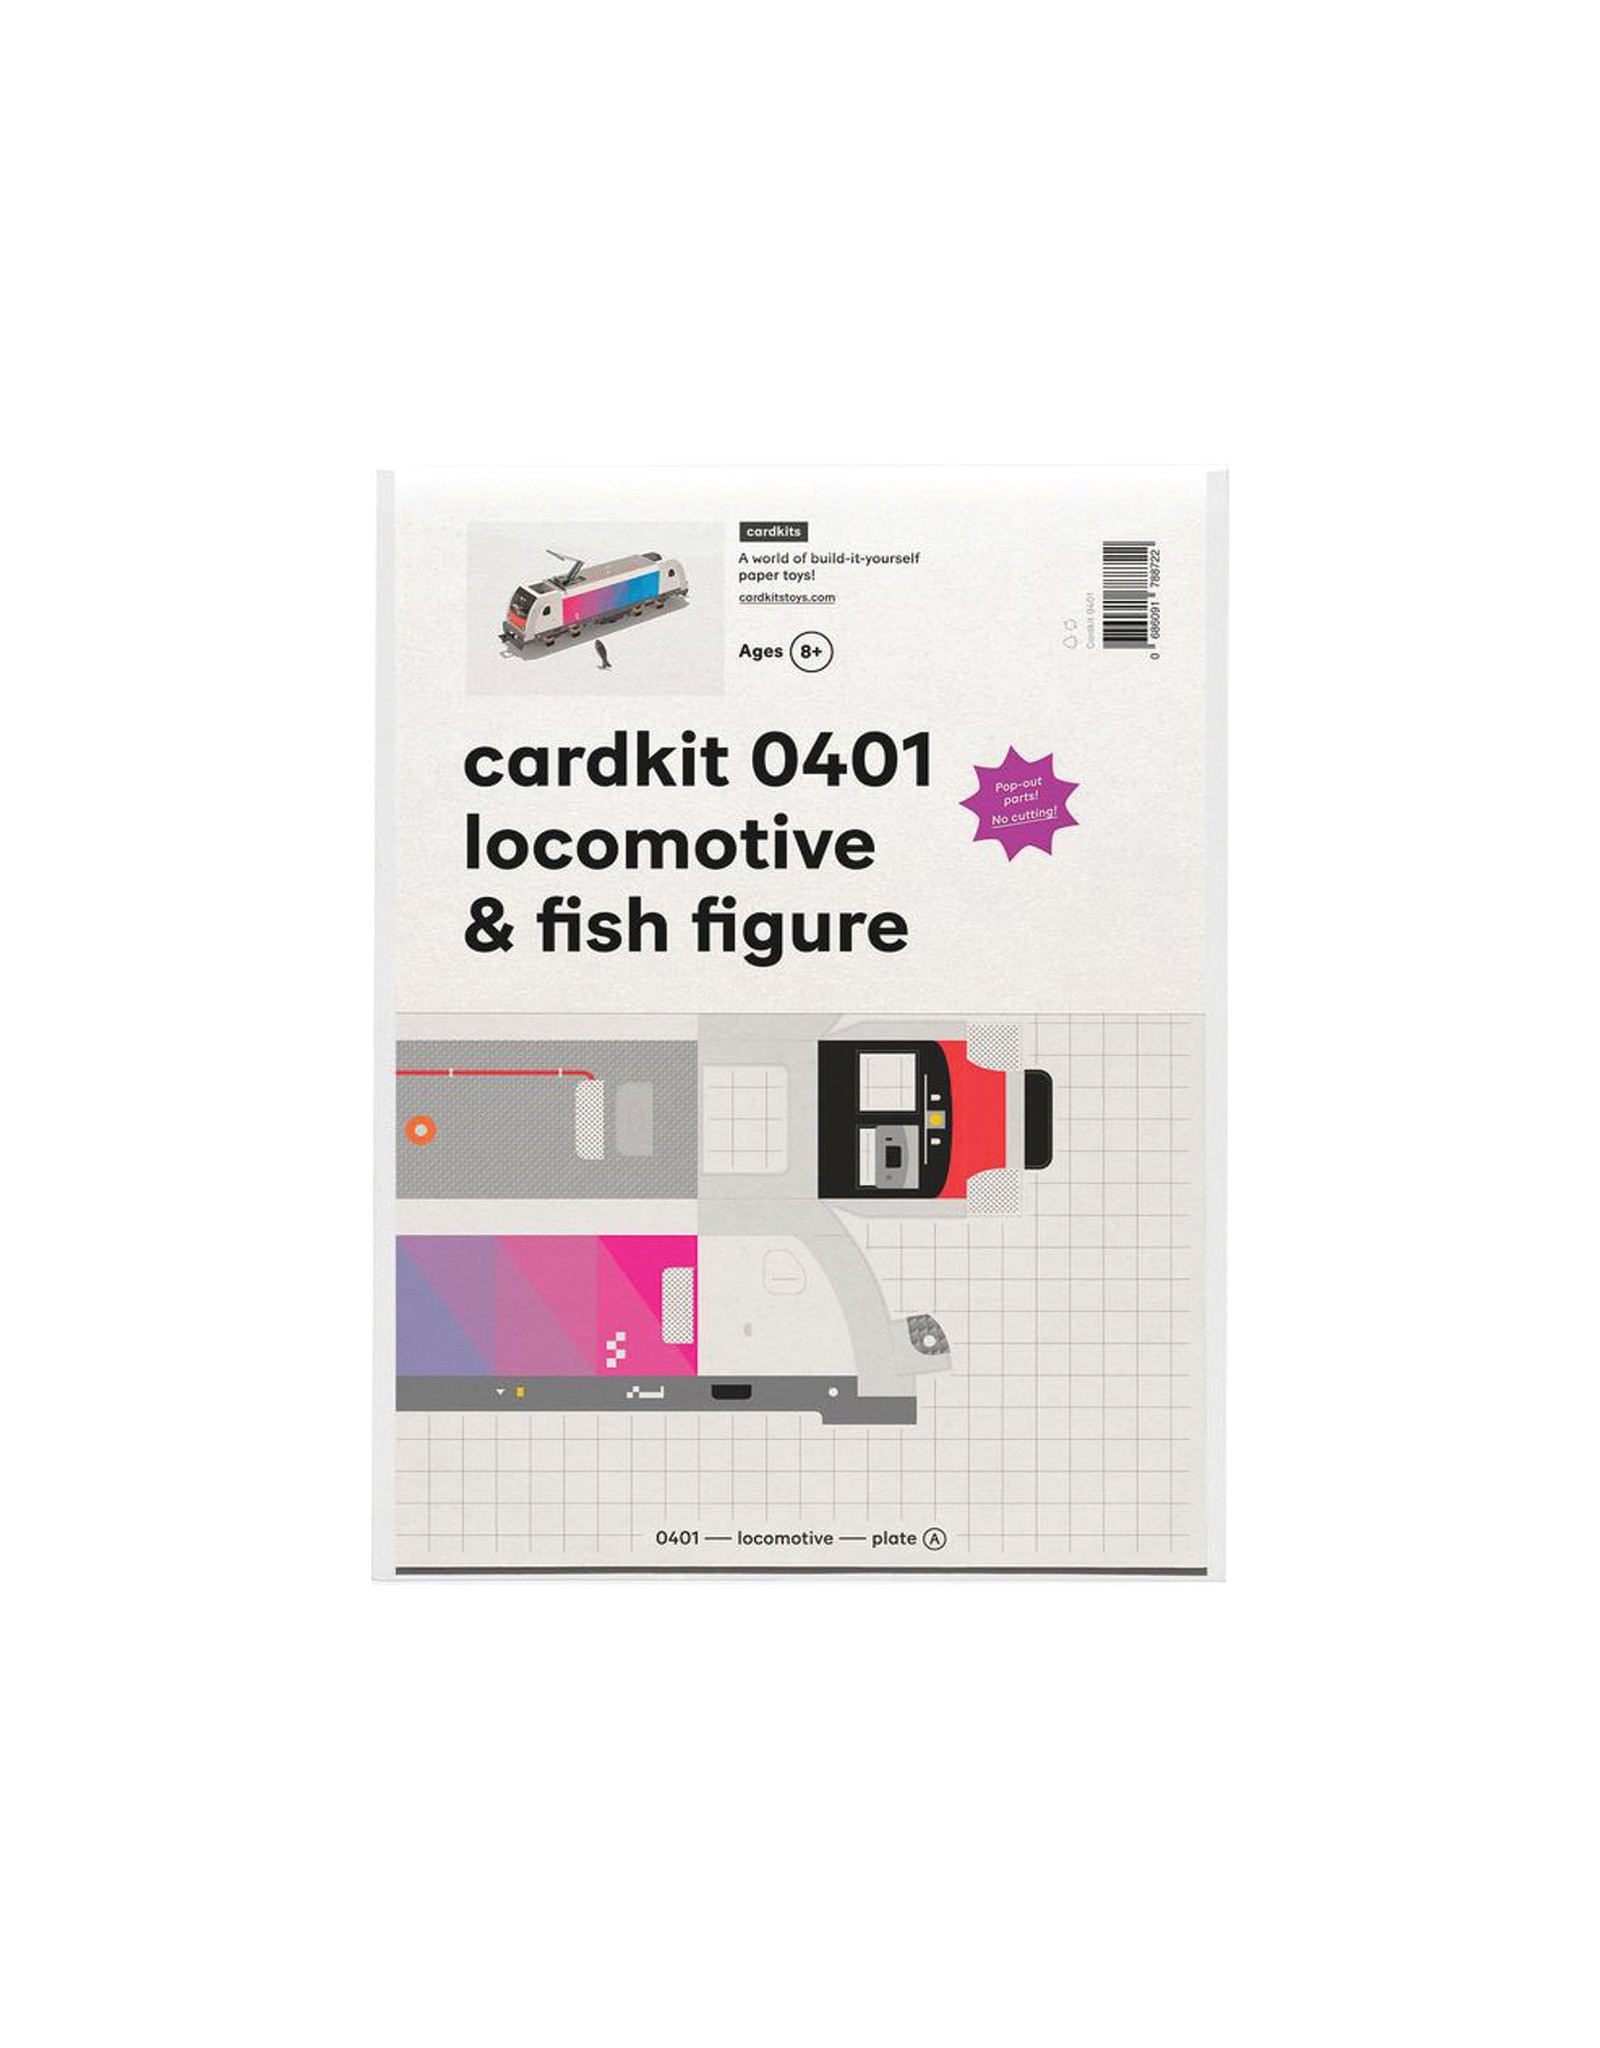 cardkit 0401: locomotive & fish figure